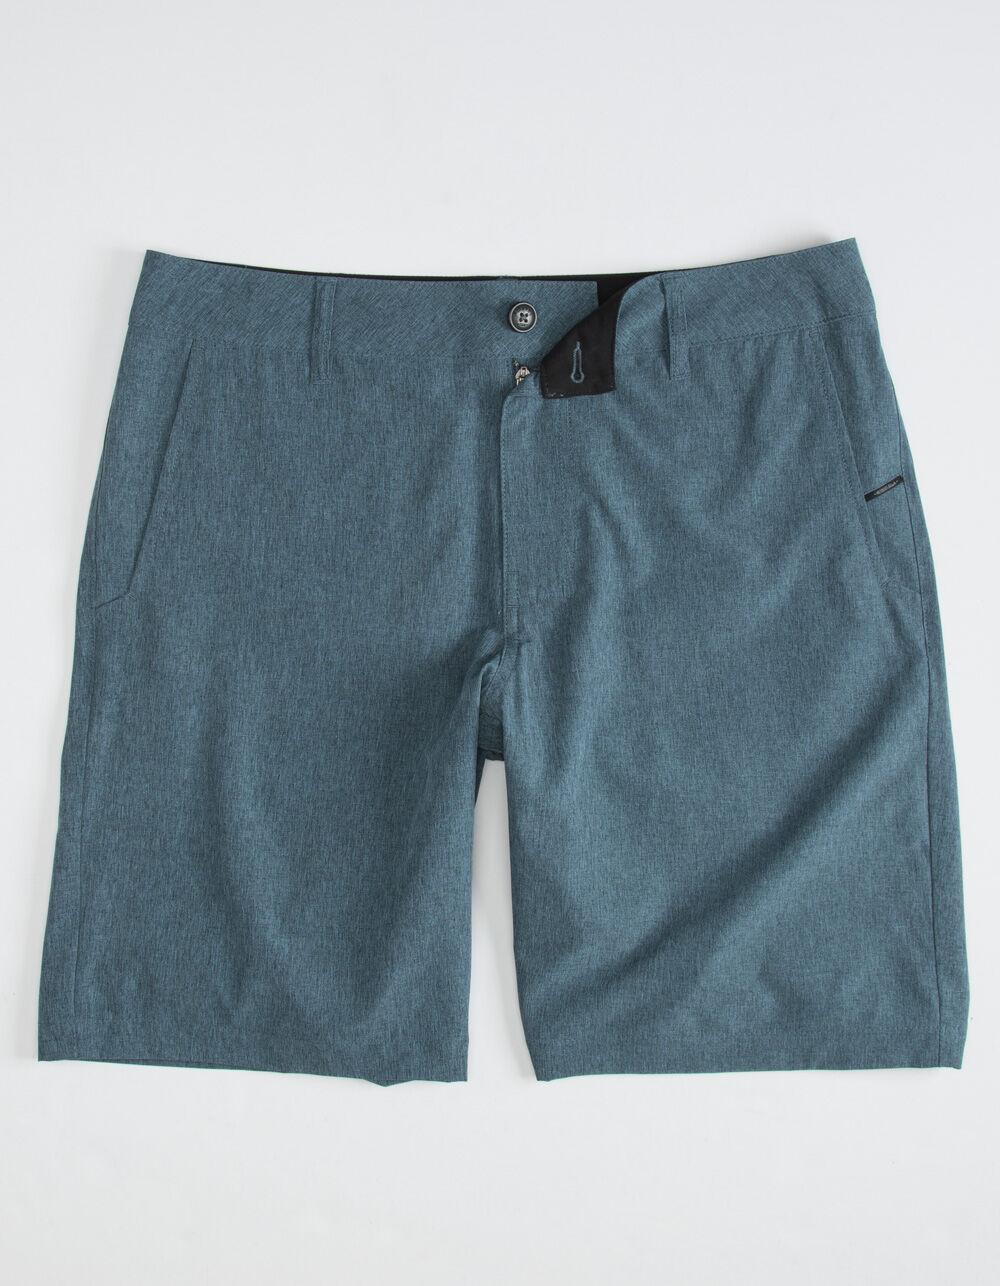 NITROUS BLACK Format Heather Blue Hybrid Shorts